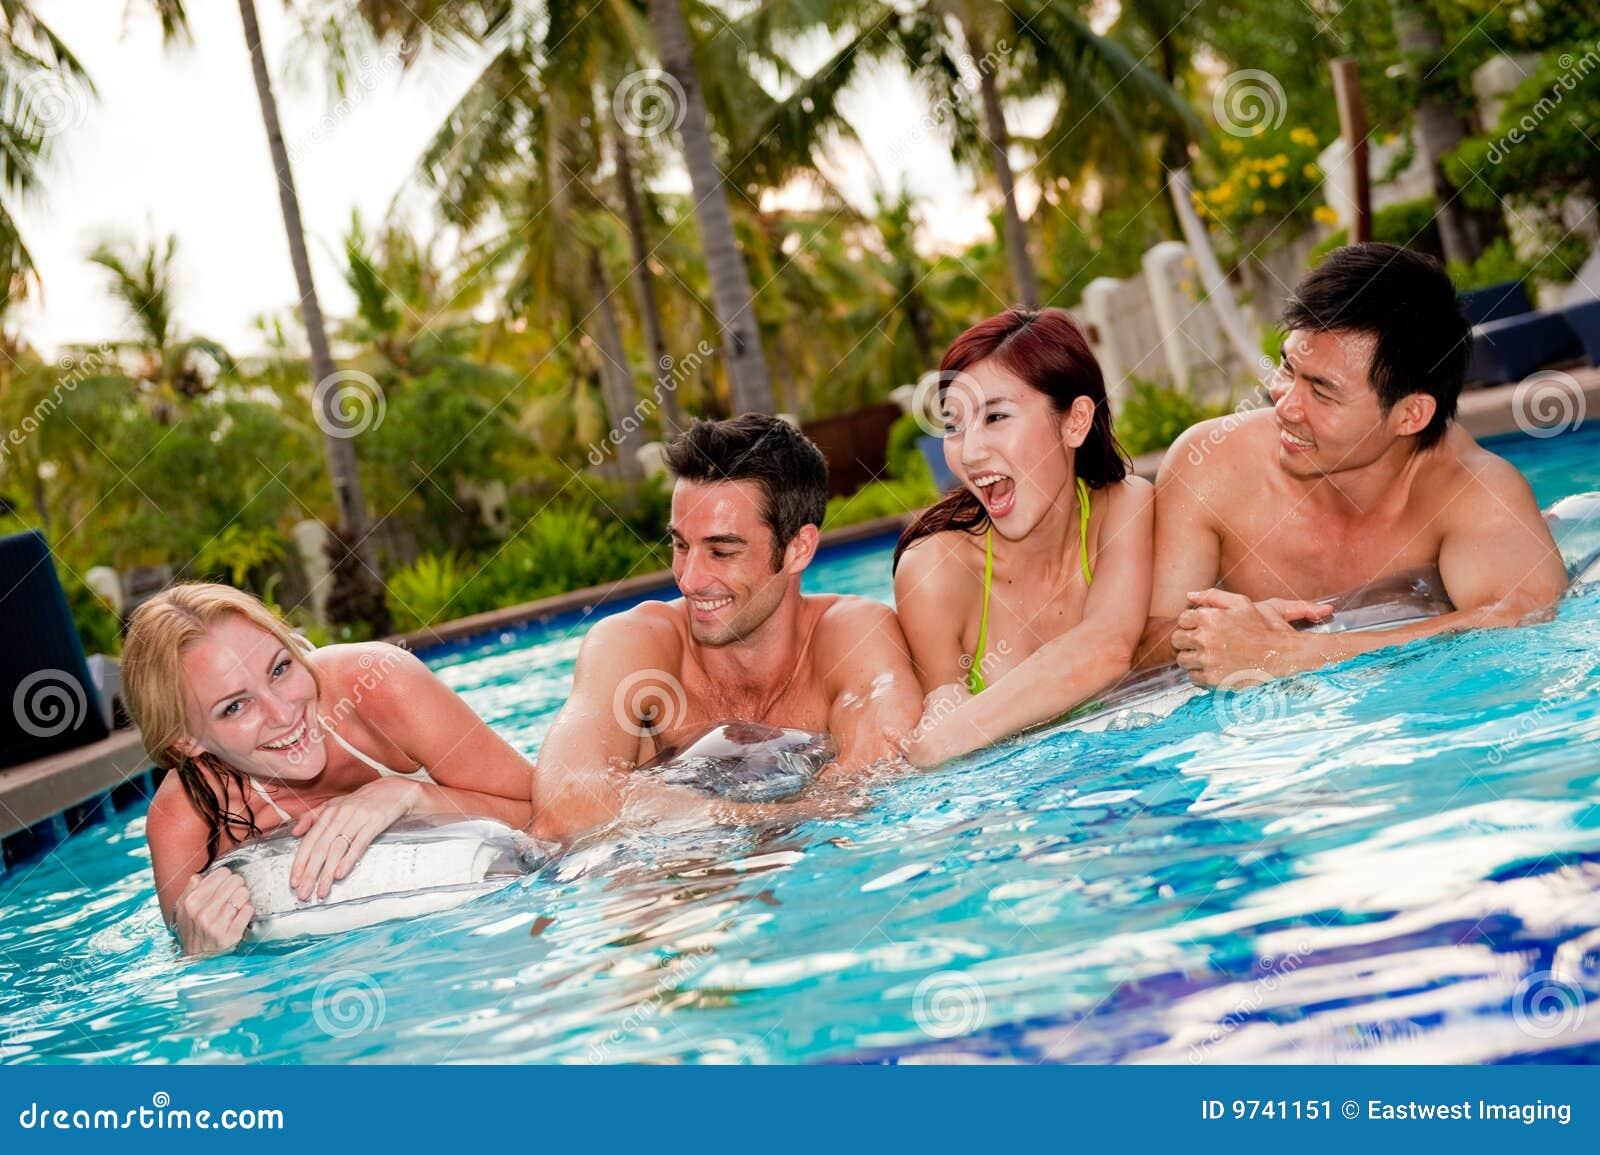 pool friends